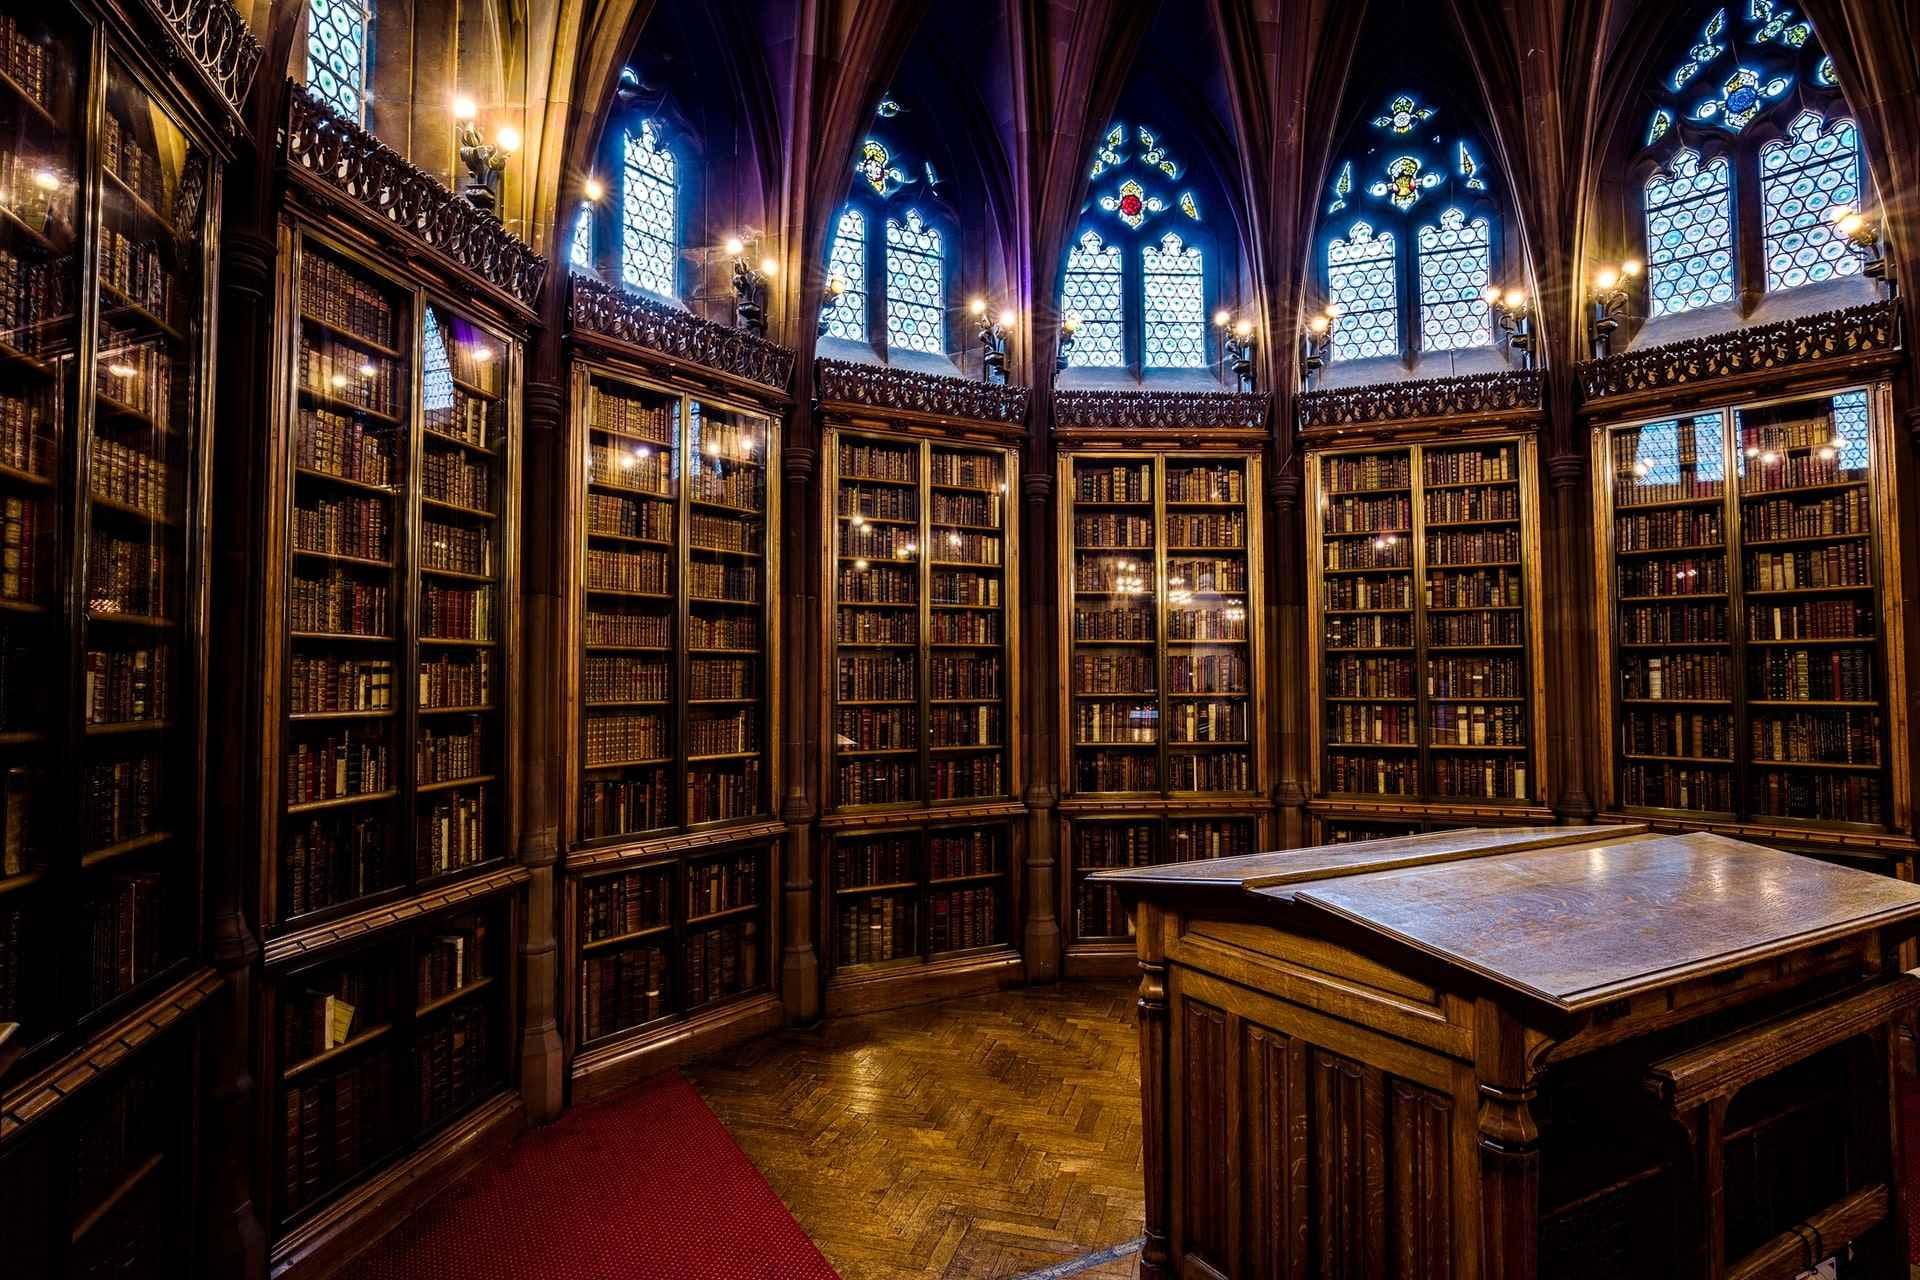 circular-reading-enclave-room-at-john-rylands-library-at-manchester-university